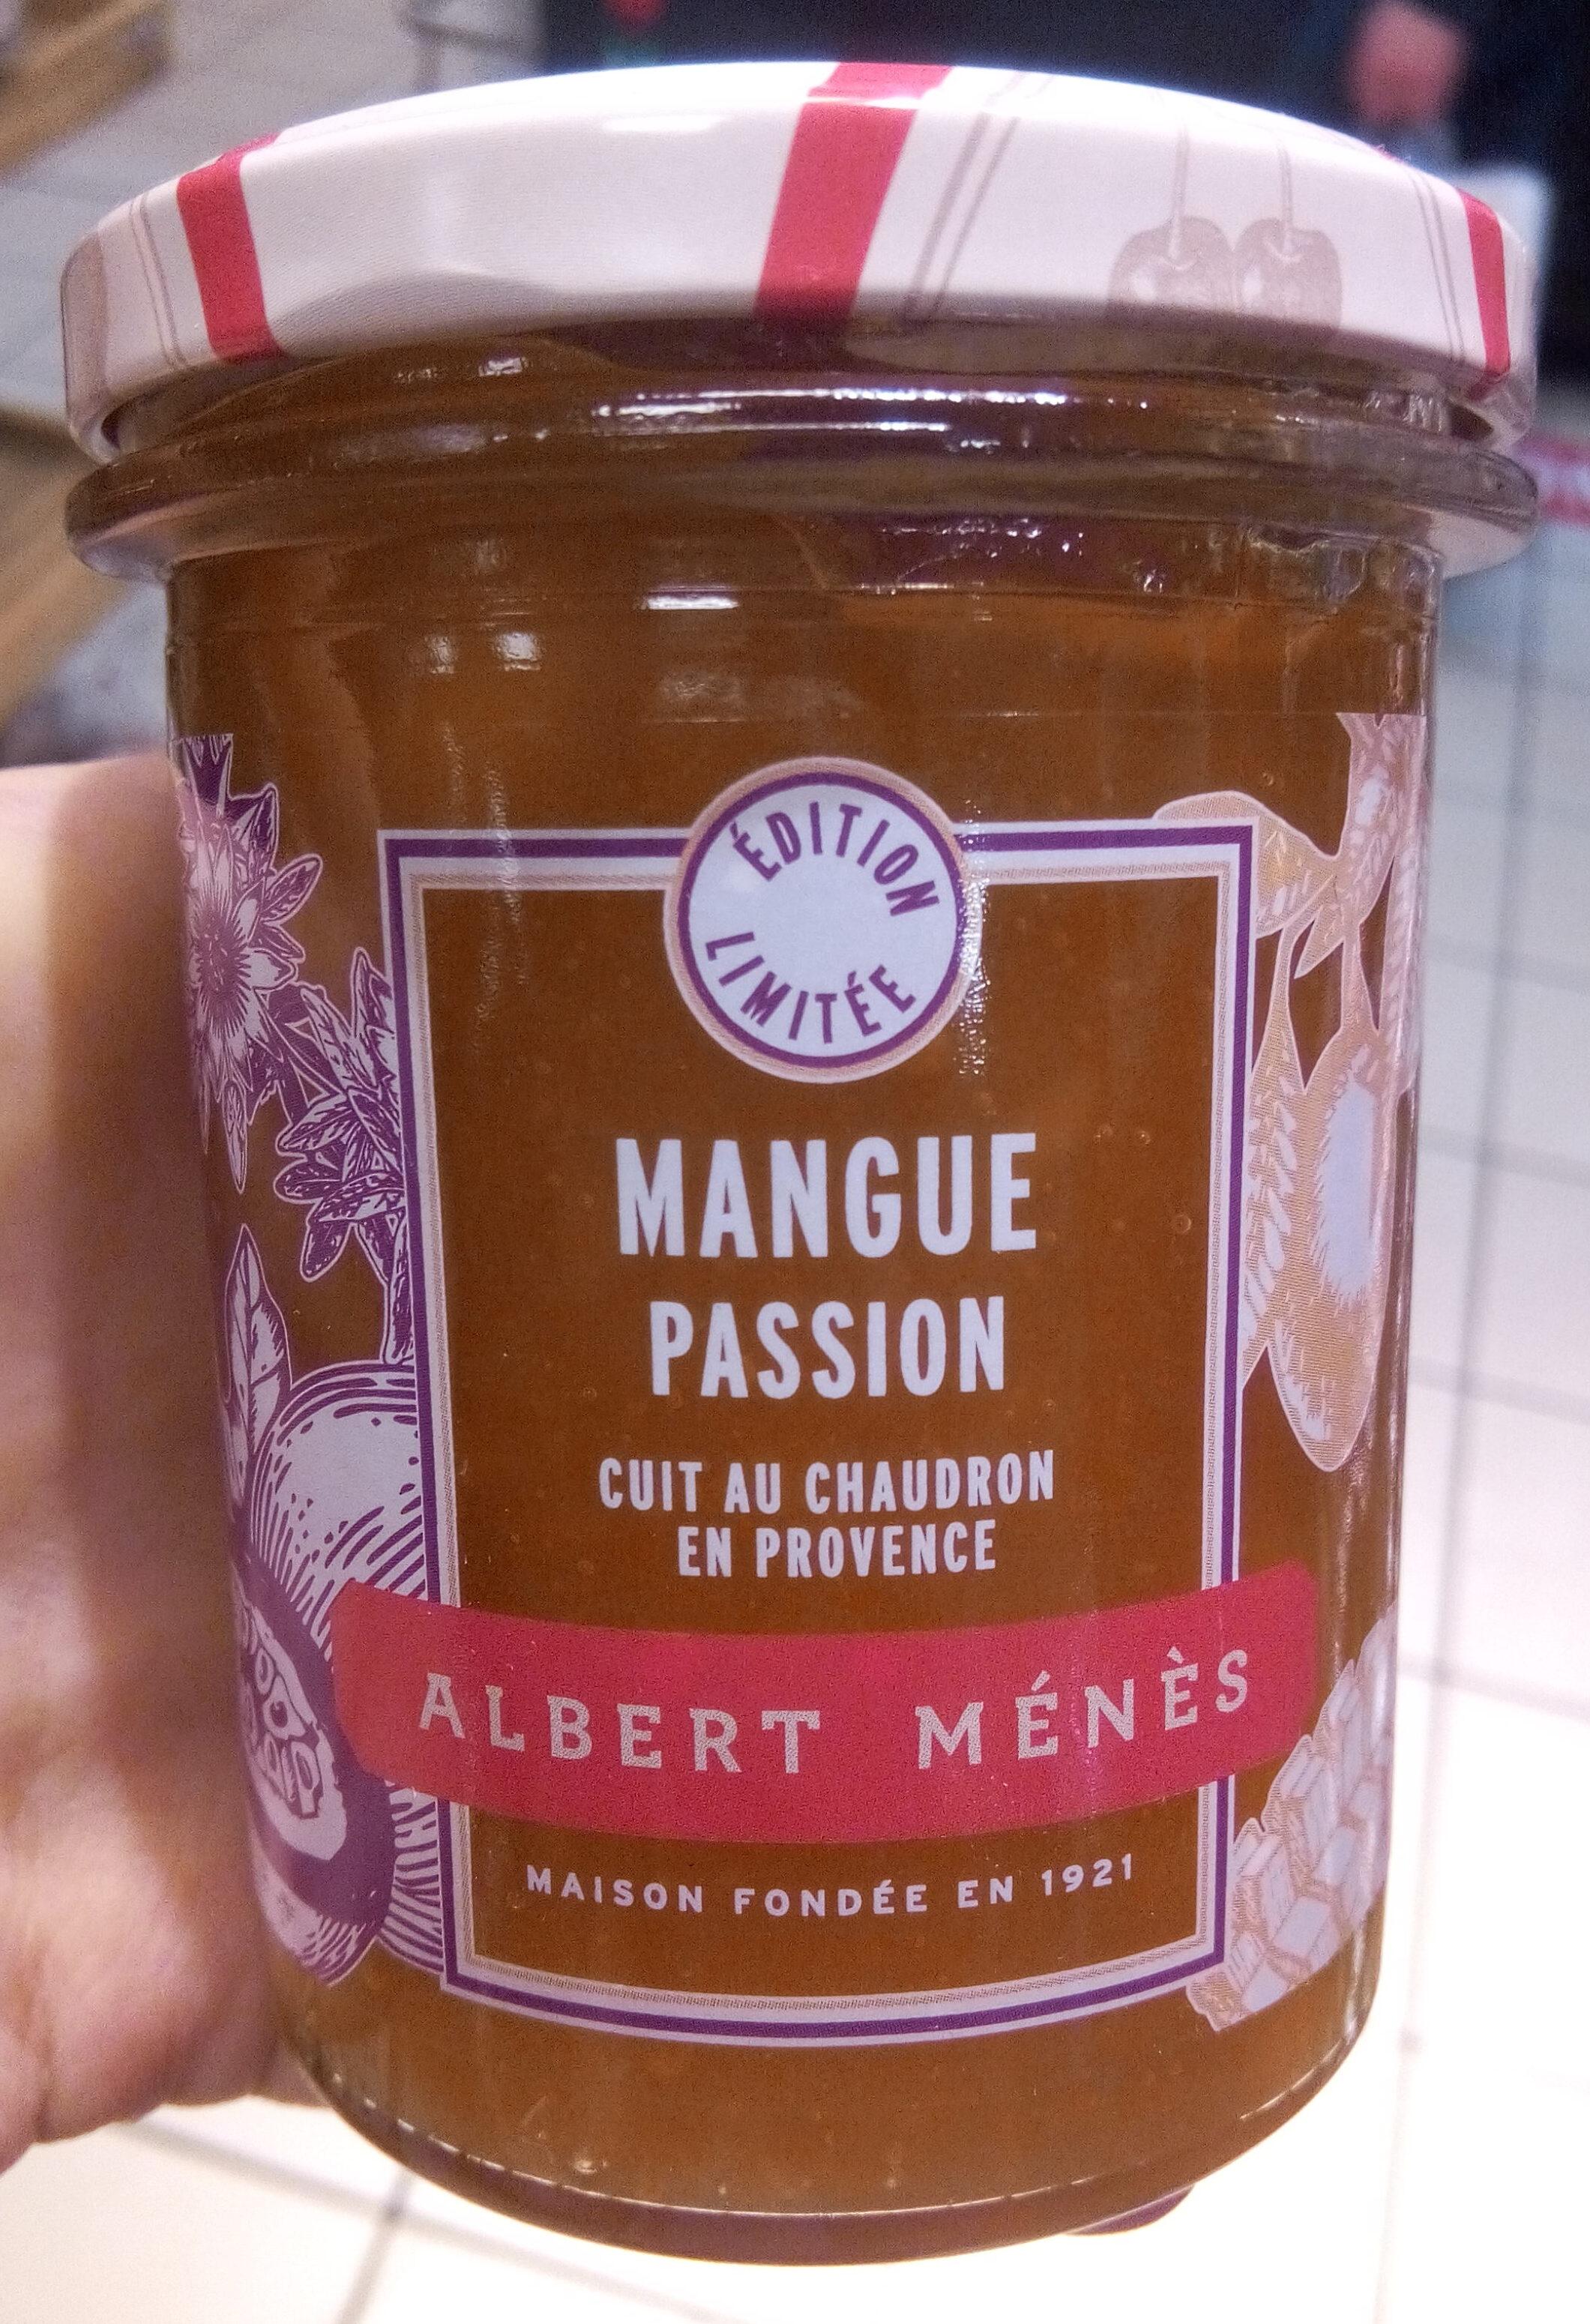 Mangue passion - Product